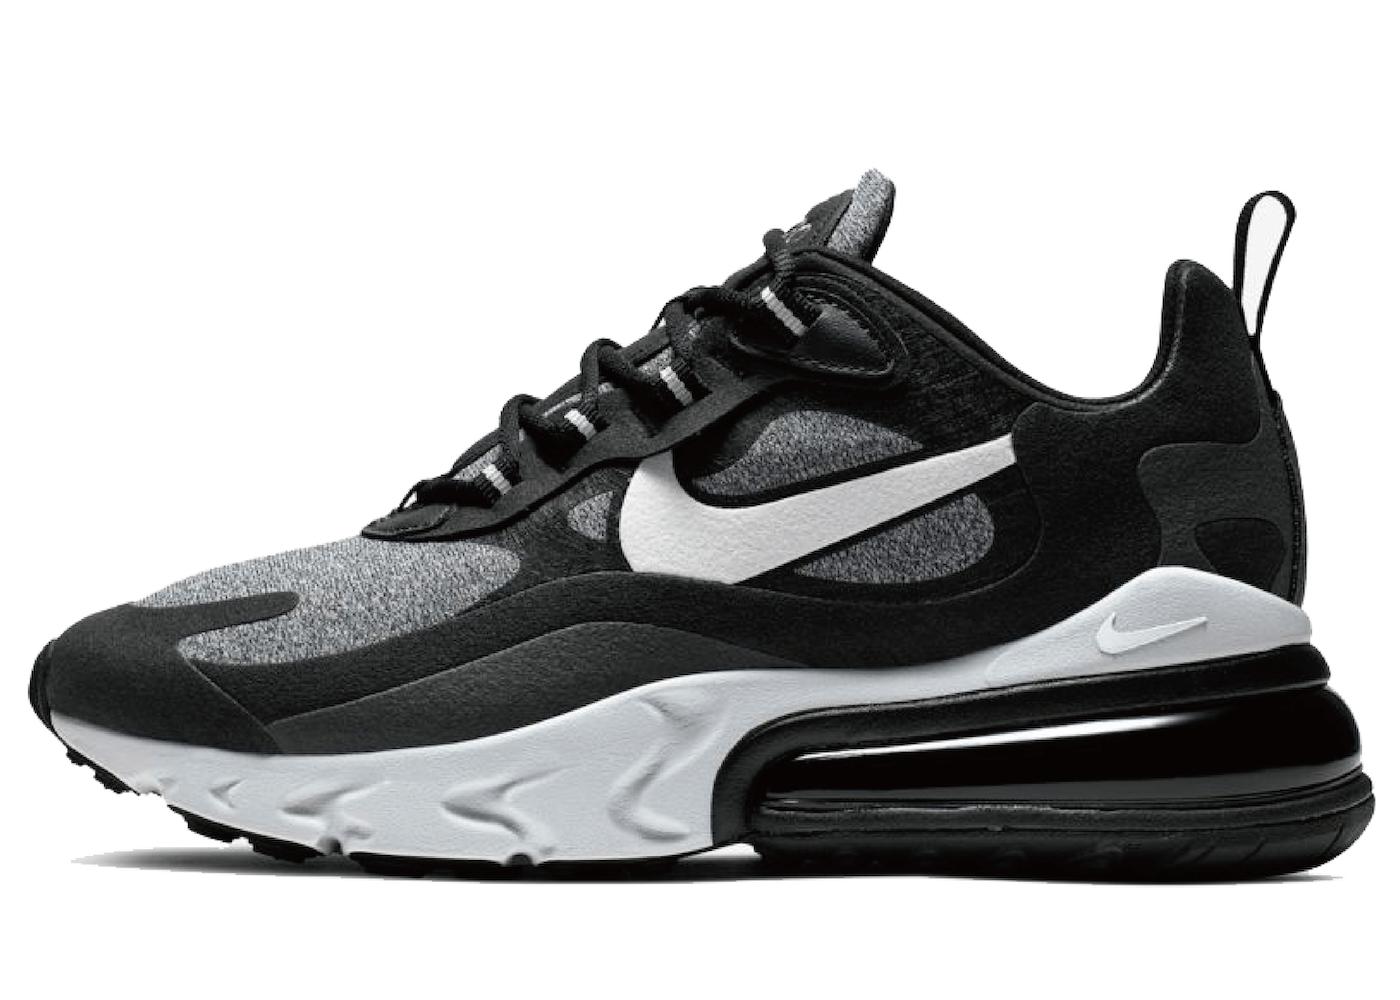 Nike Air Max 270 React Black Vast Greyの写真